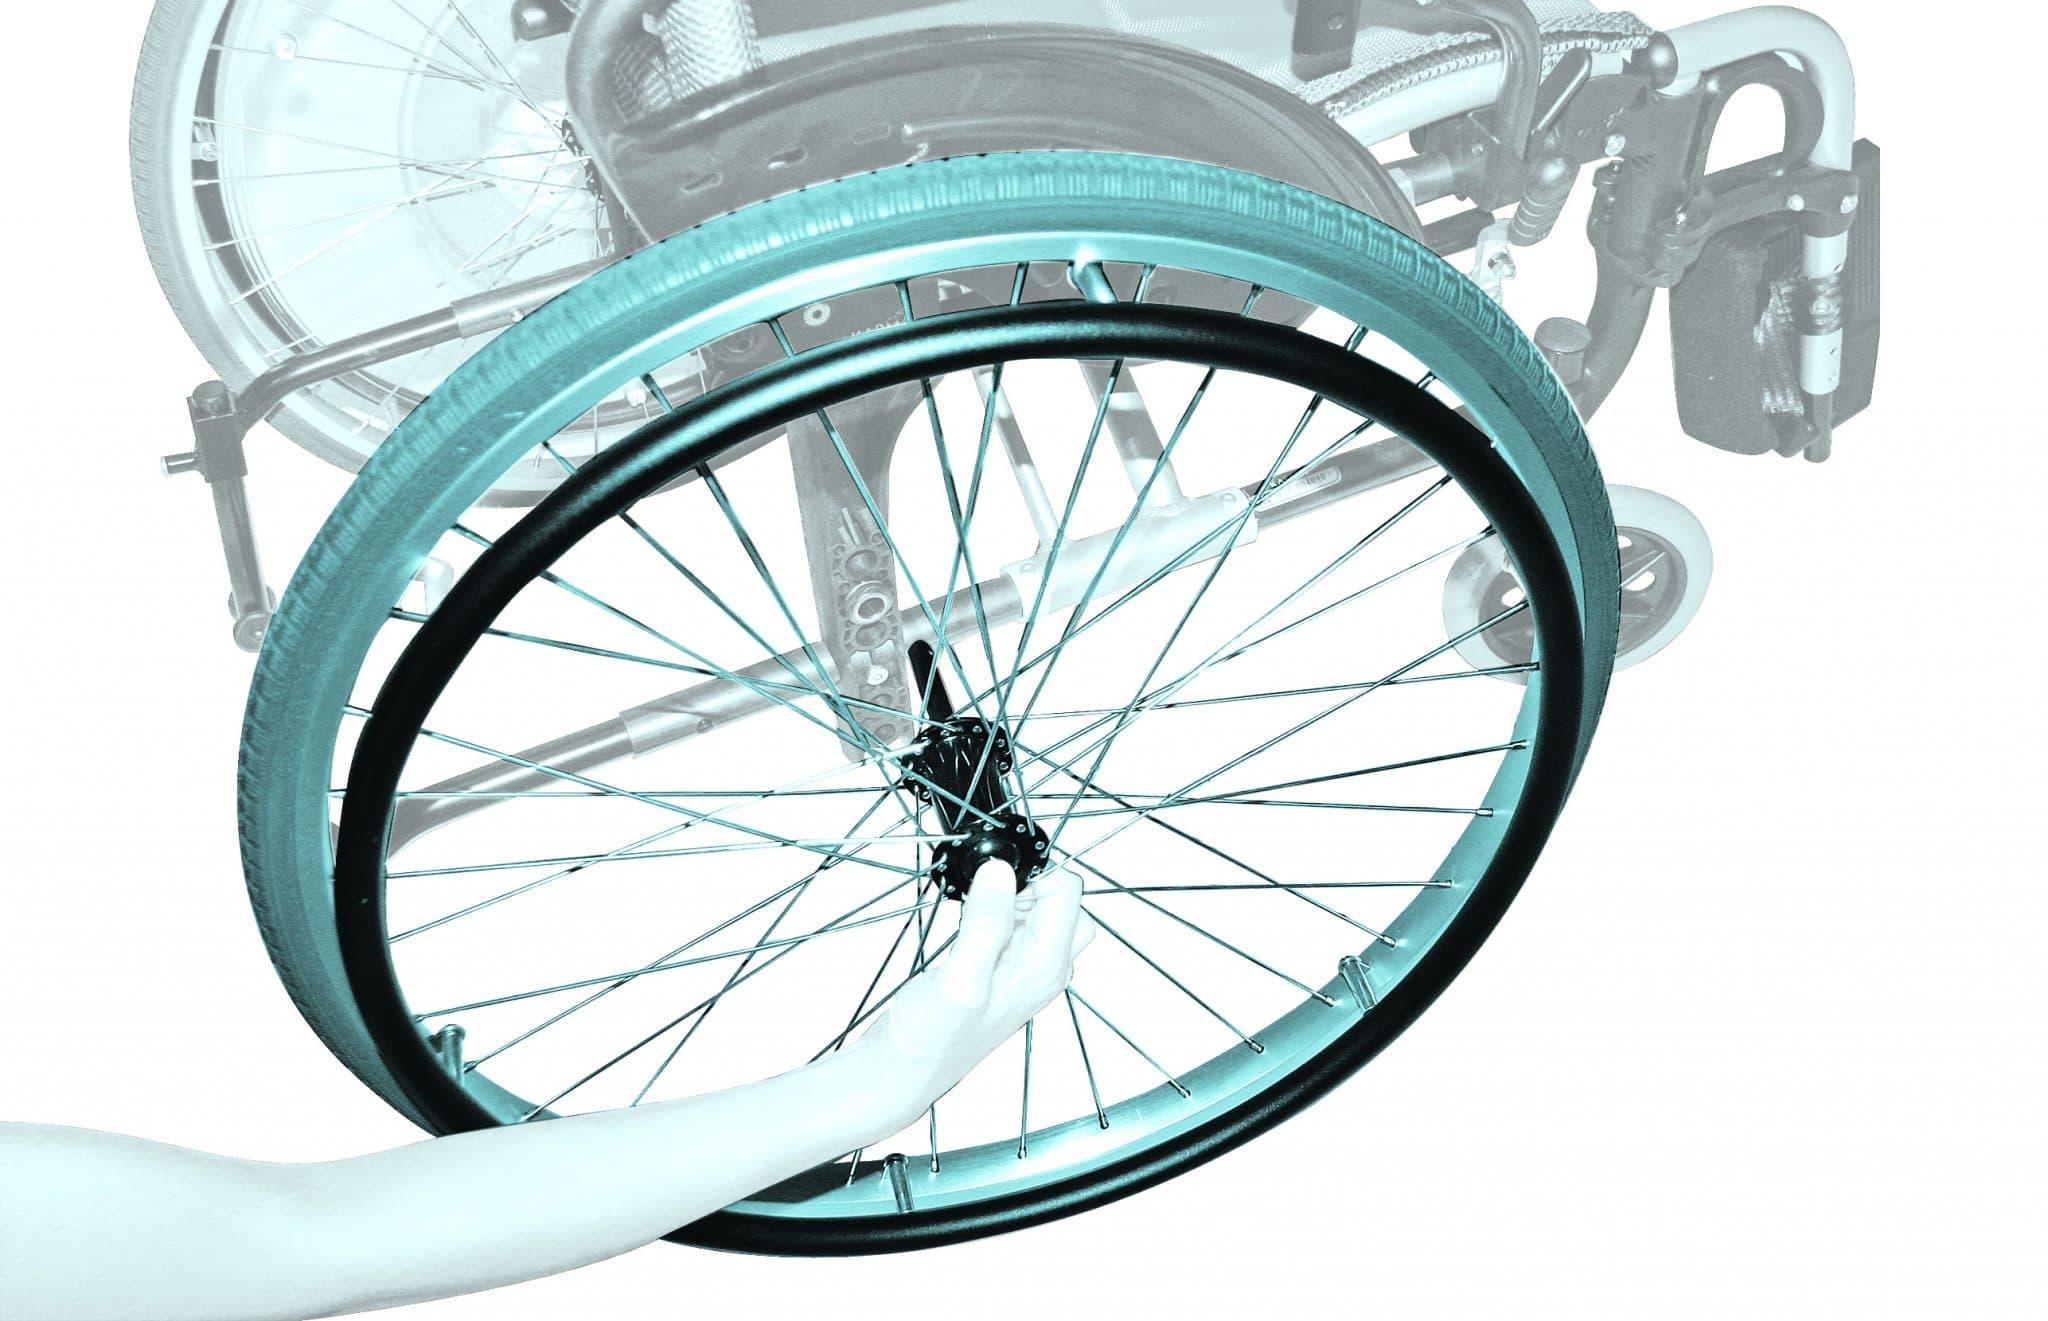 Pormenor de roda de cadeira de rodas manual